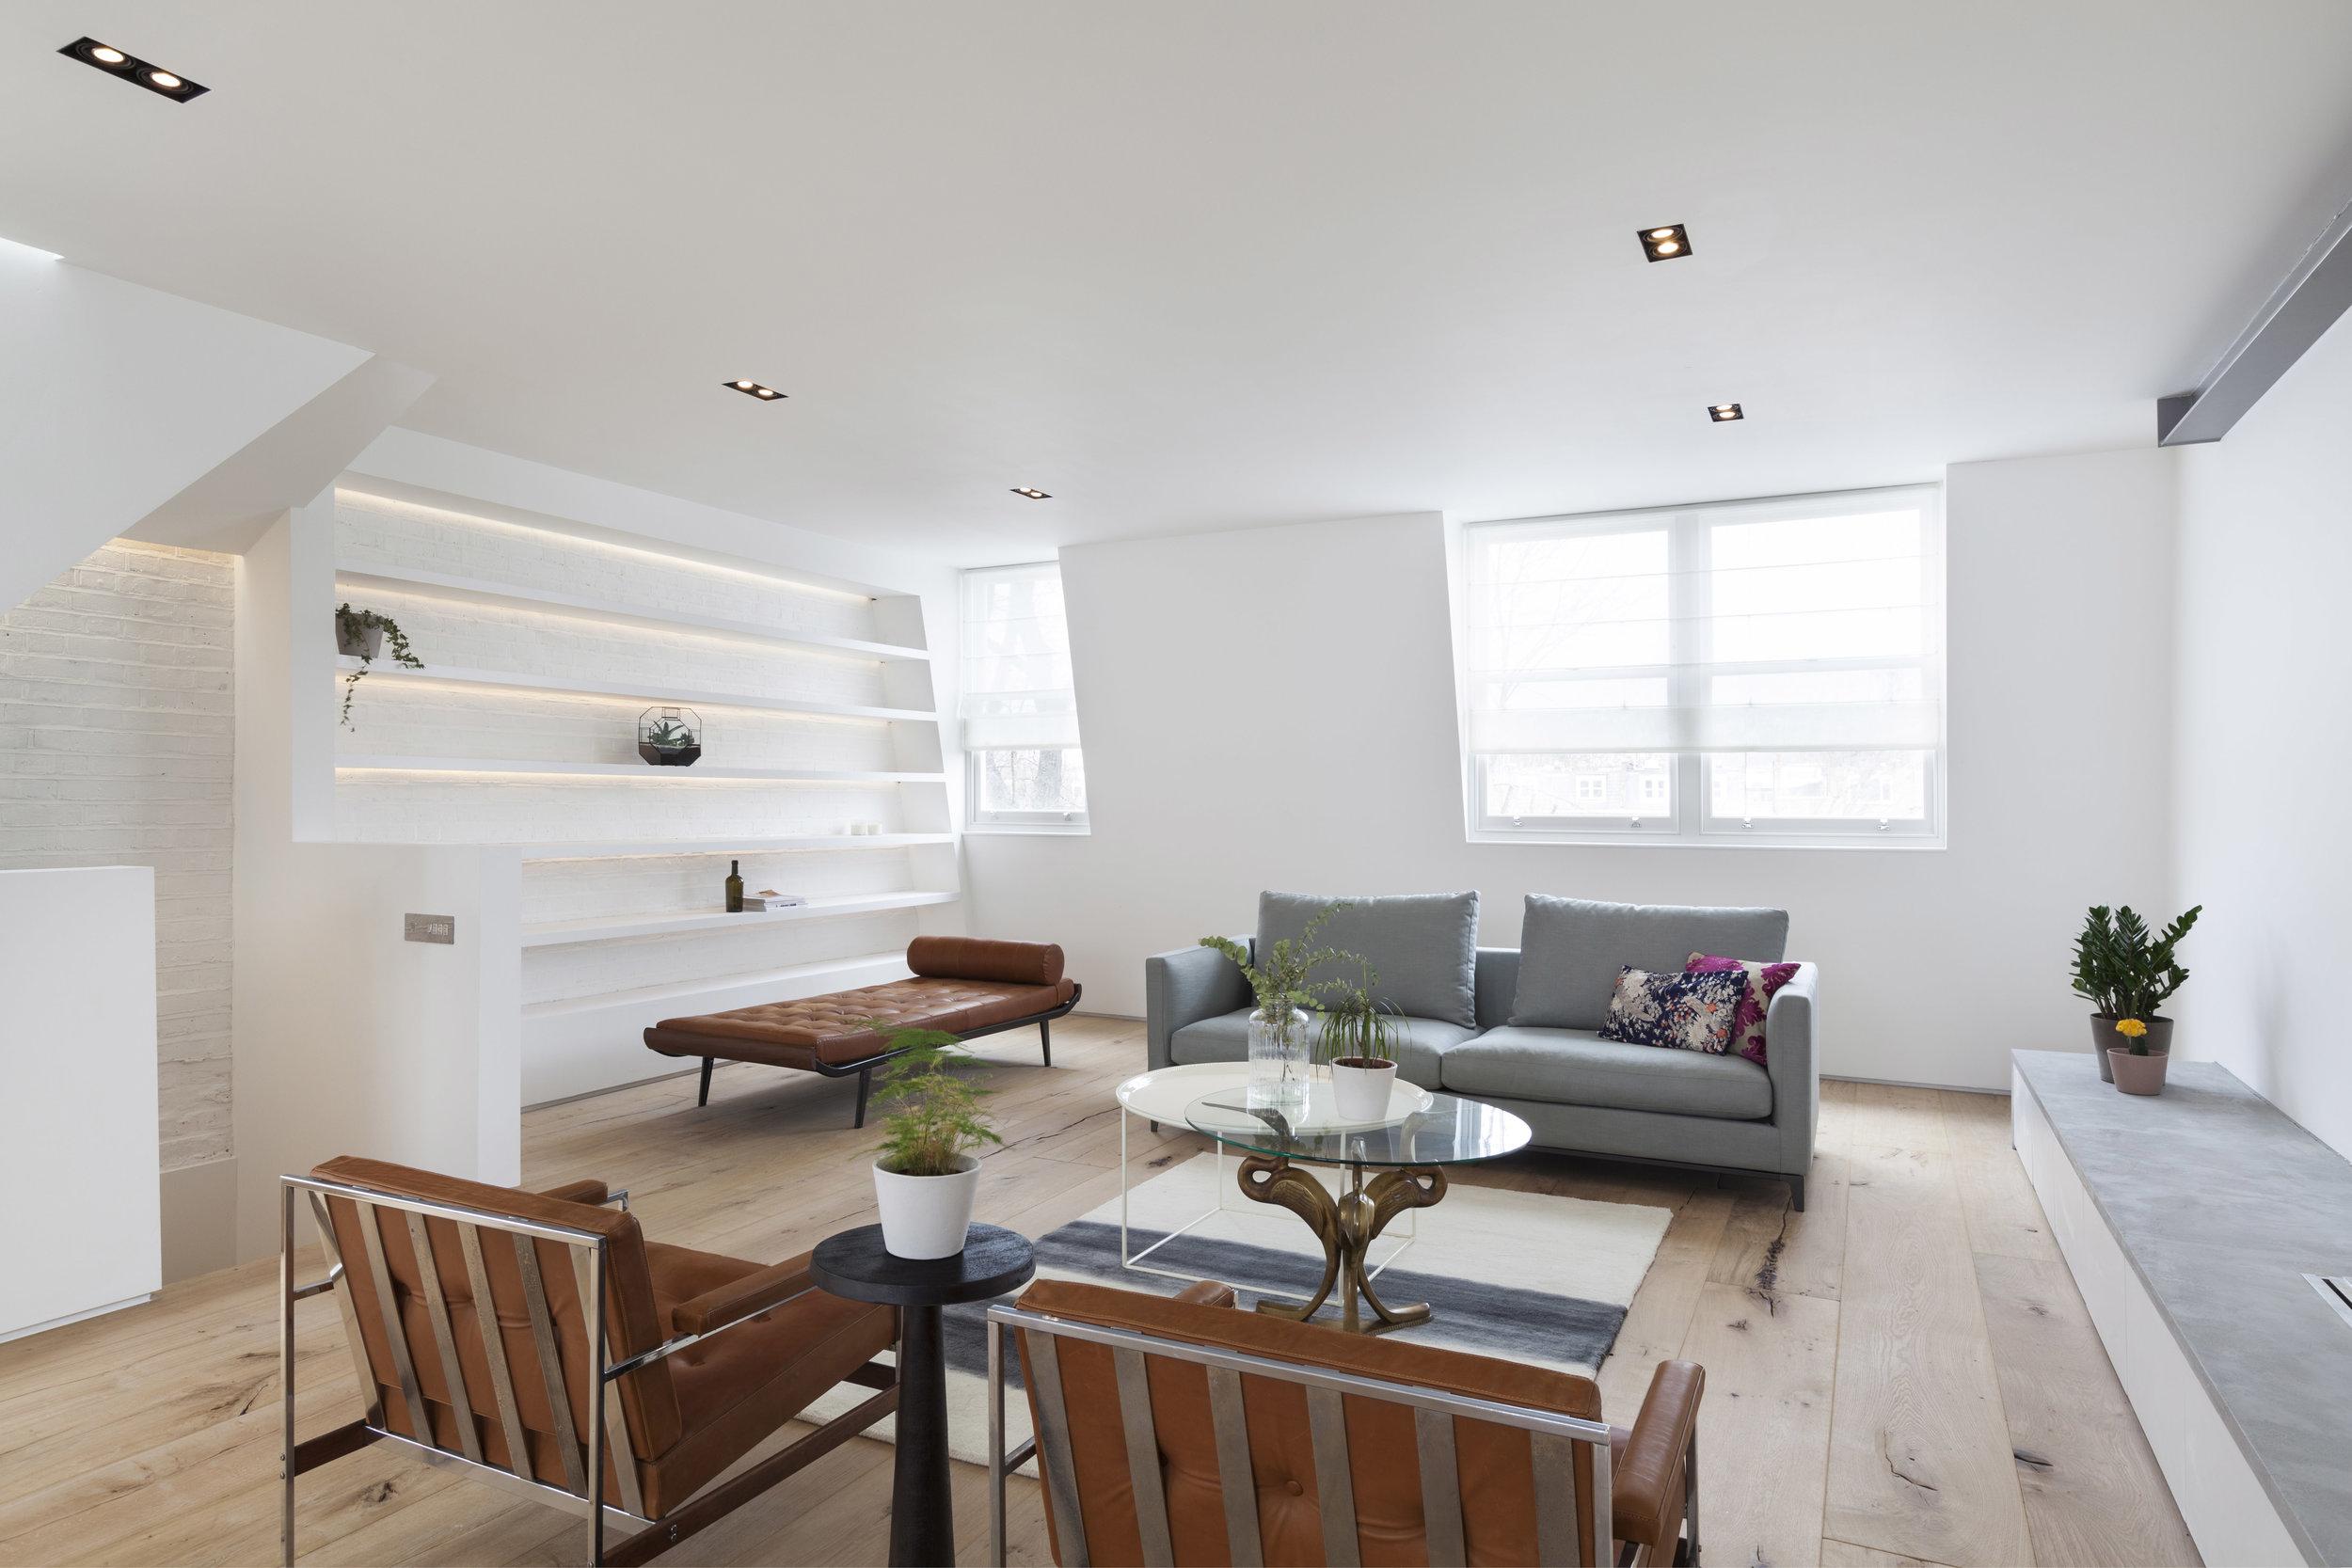 Domus-Nova-Sinclair-Road-London-Property-For-Sale-141.jpg